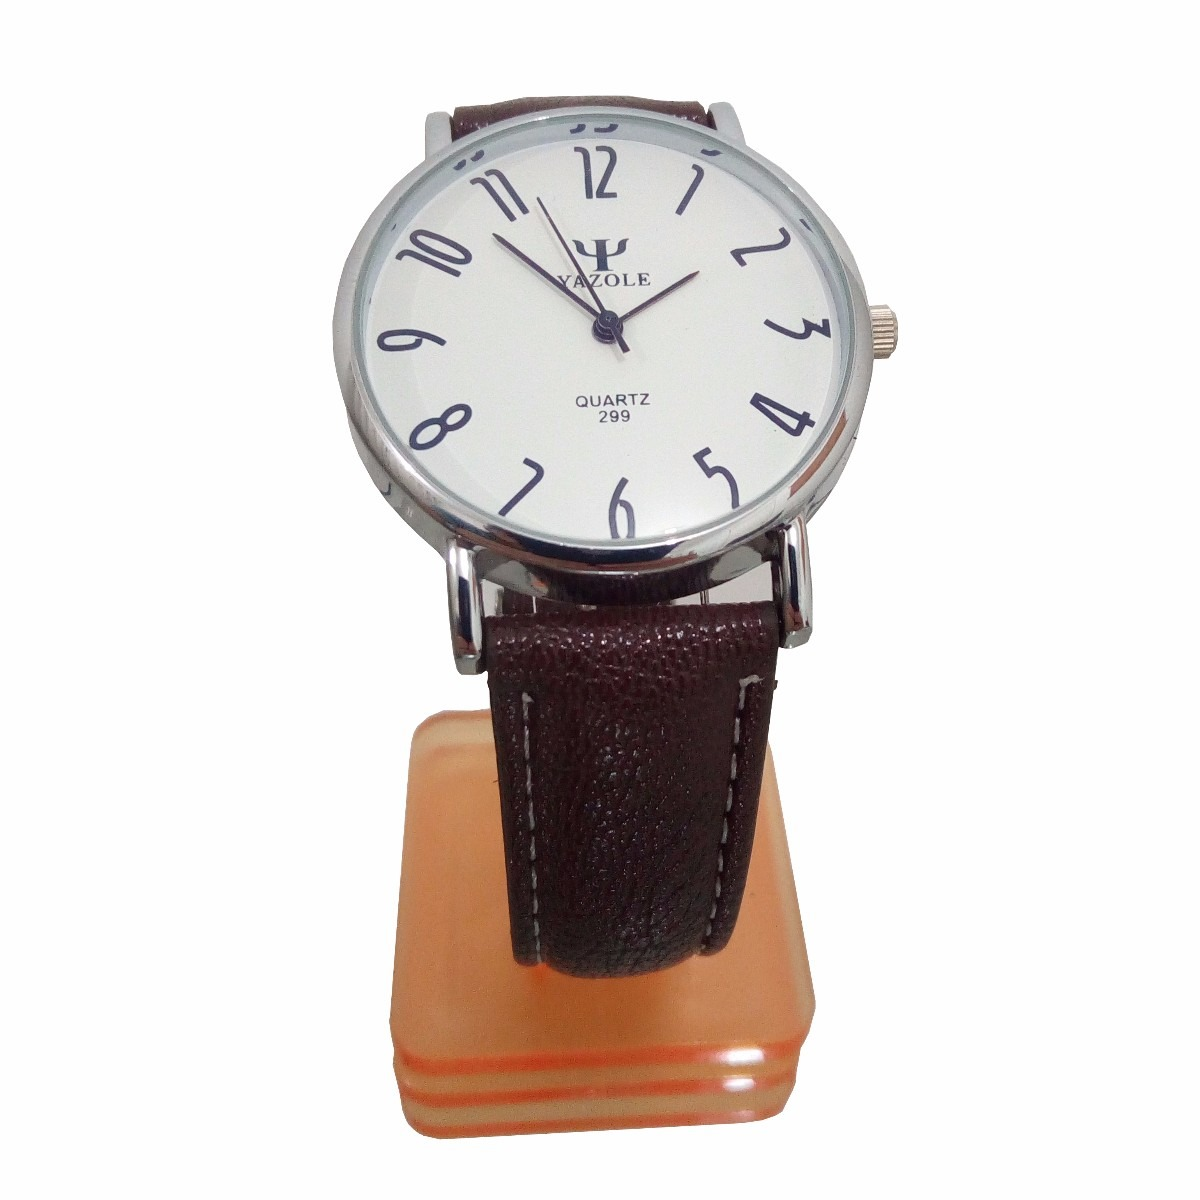 bb6bd98c371 relógio masculino social yazole importado promoção barato. Carregando zoom.